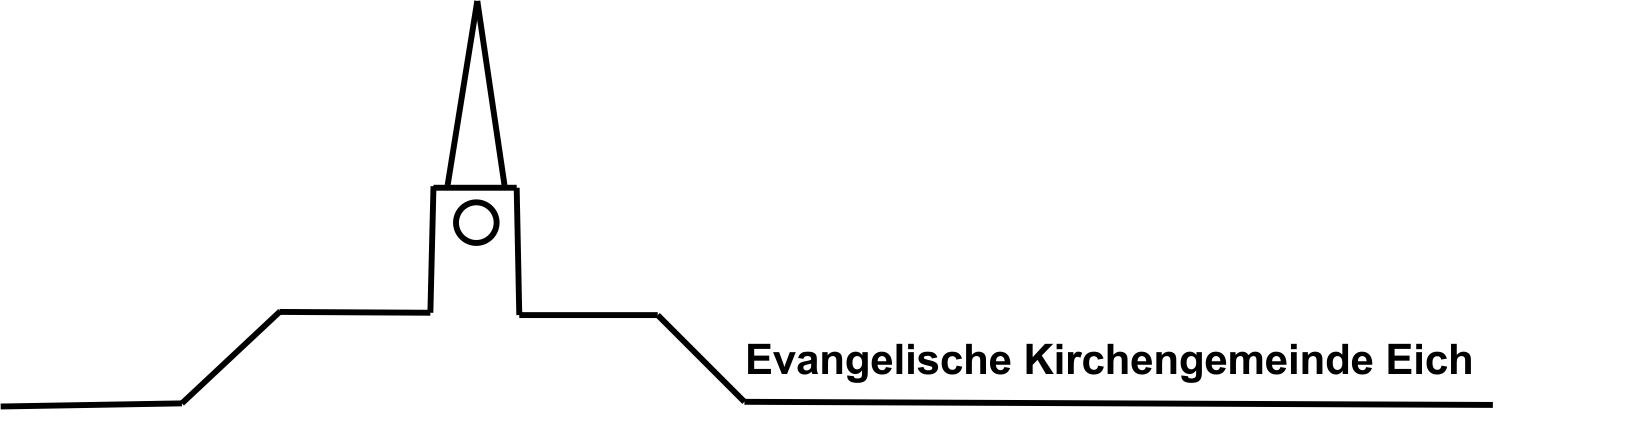 evang_eich_logo